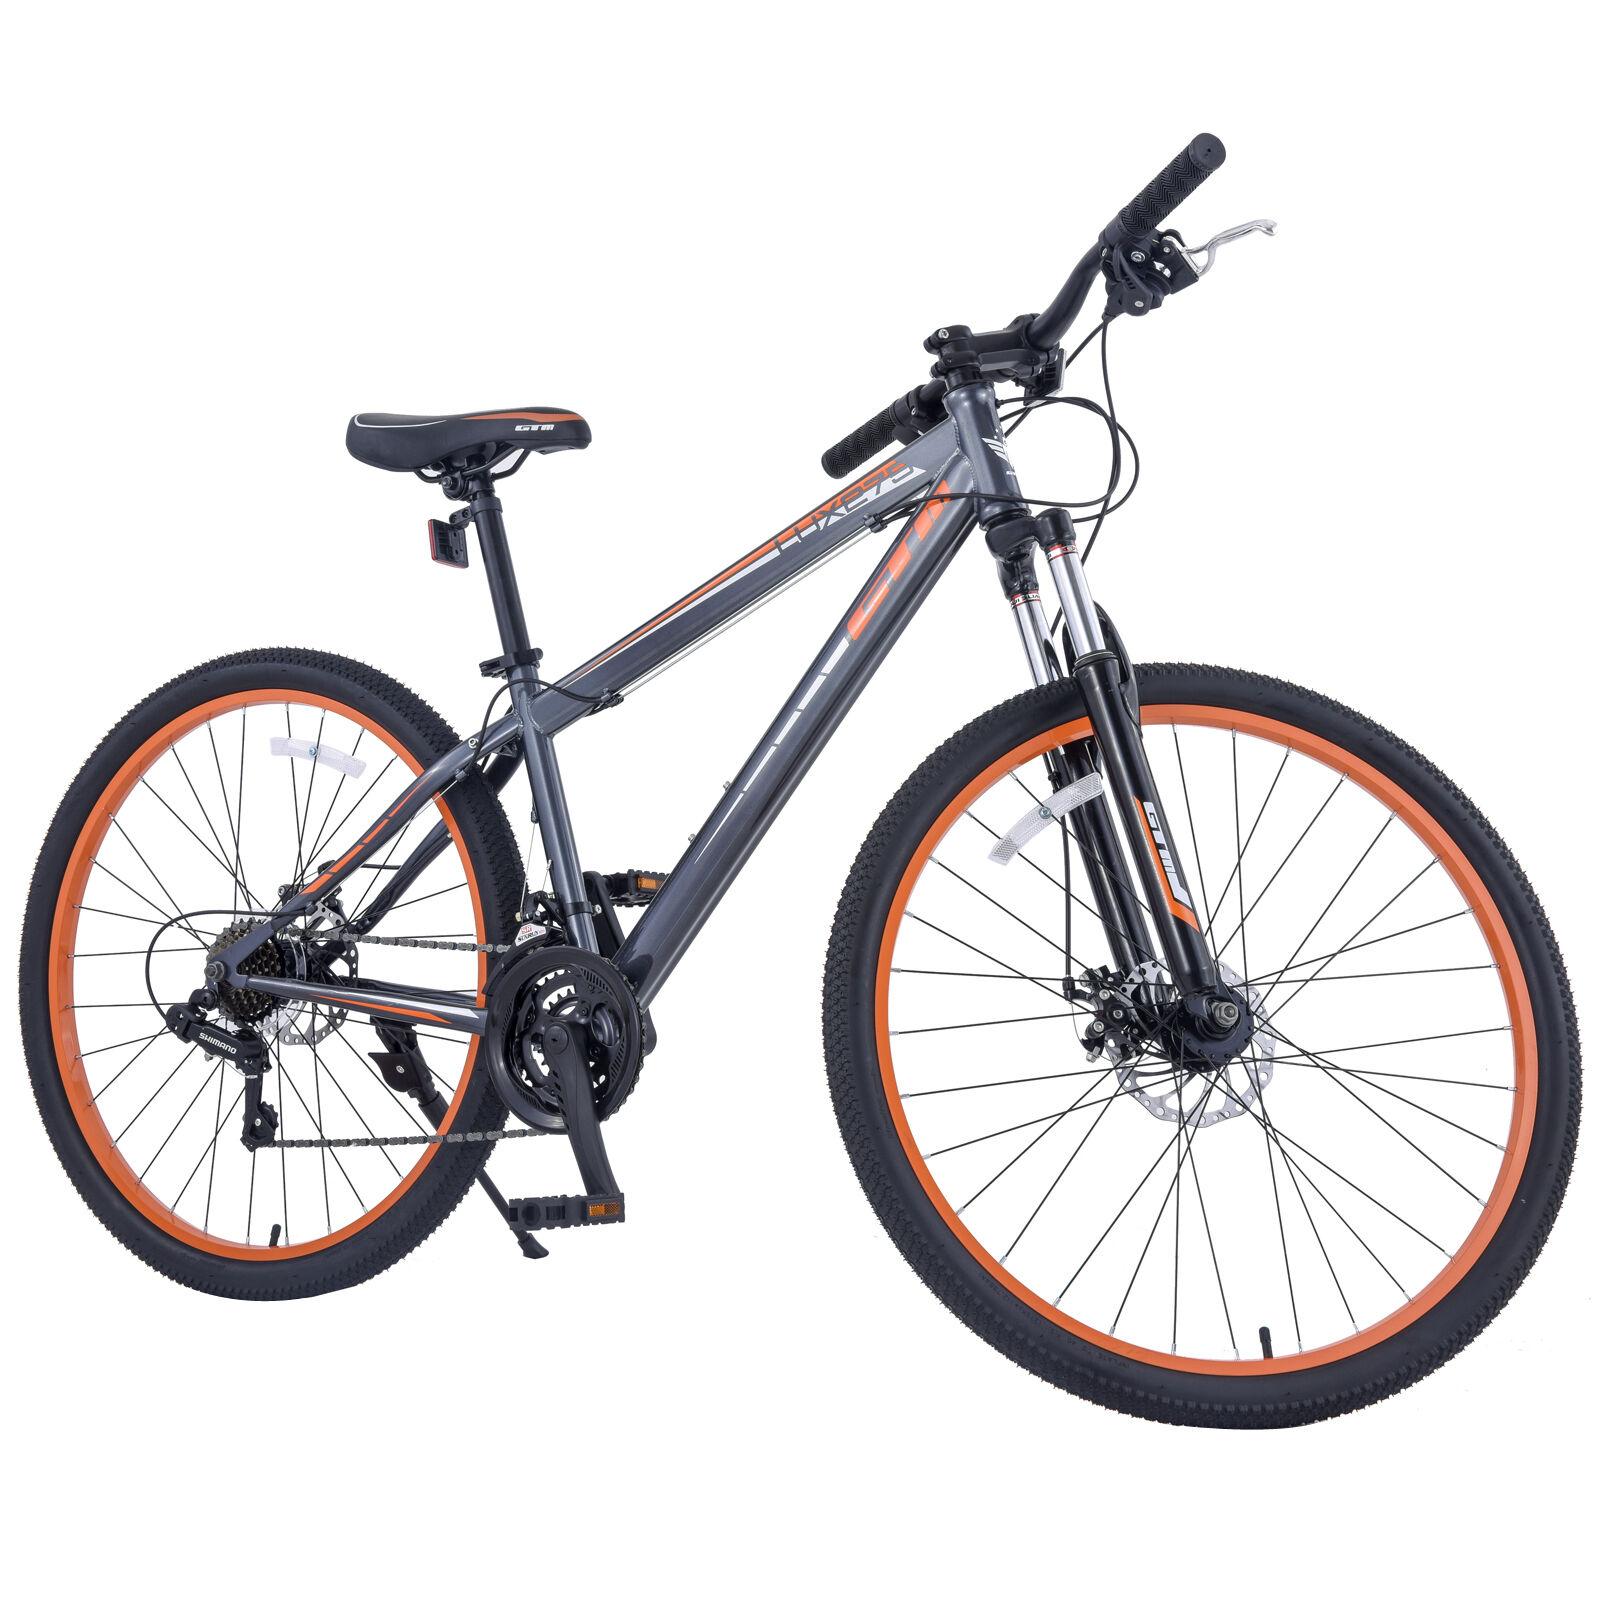 21 speed 27 5 men 39 s mountain bike shimano hybrid bicycle. Black Bedroom Furniture Sets. Home Design Ideas